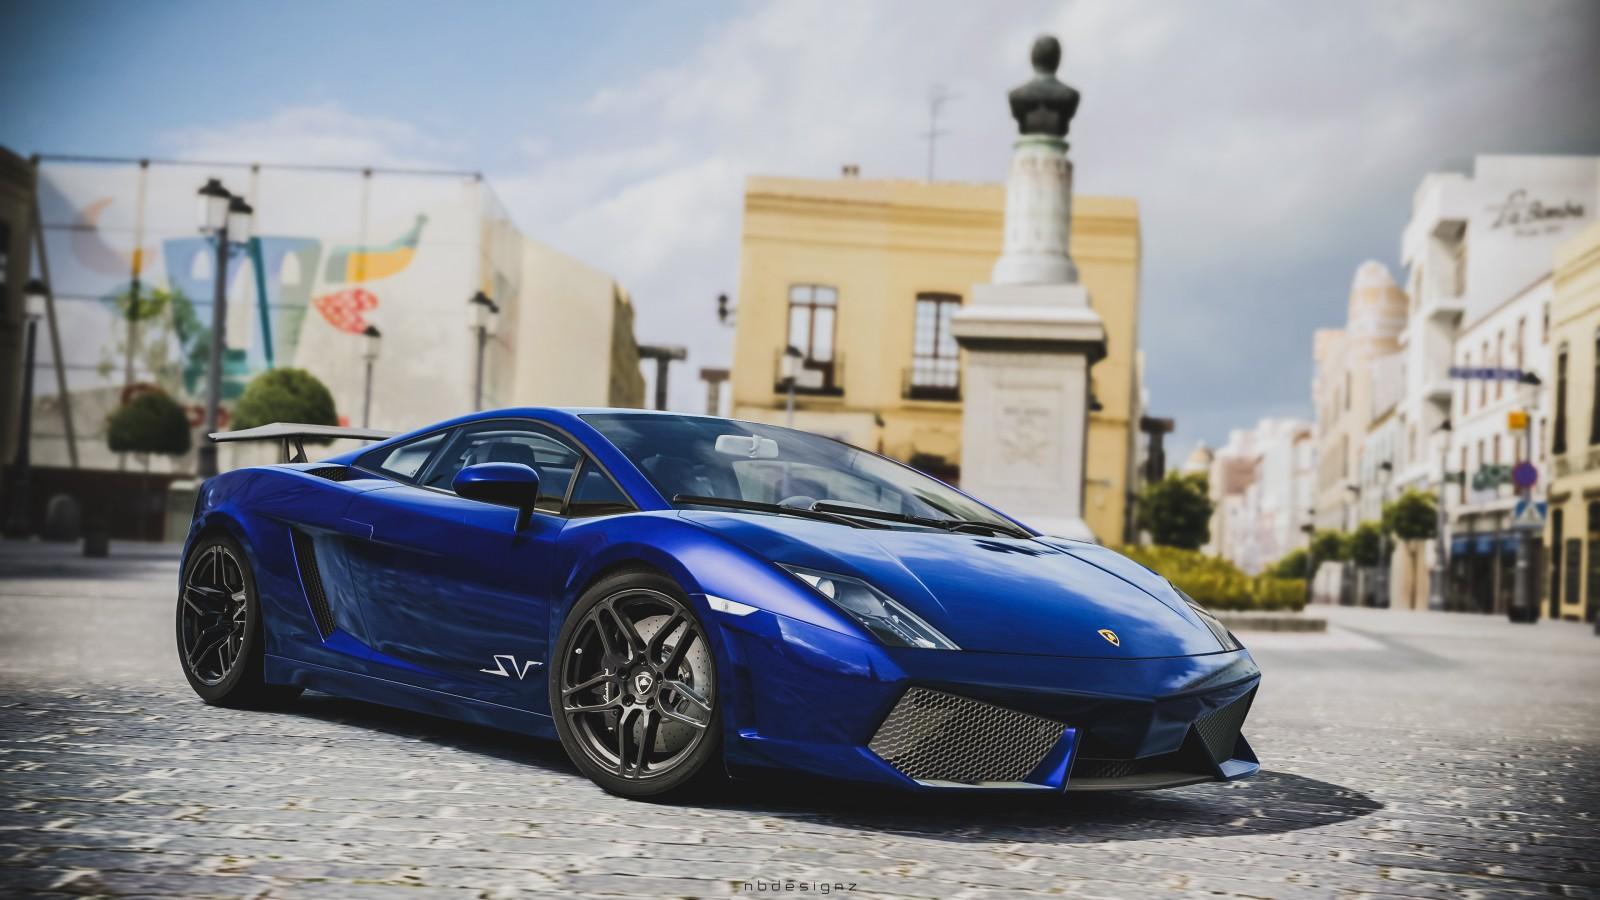 Lamborghini Diablo Wallpaper Hd Lamborghini Gallardo Sv Gran Turismo 6 Wallpaper Hd Car